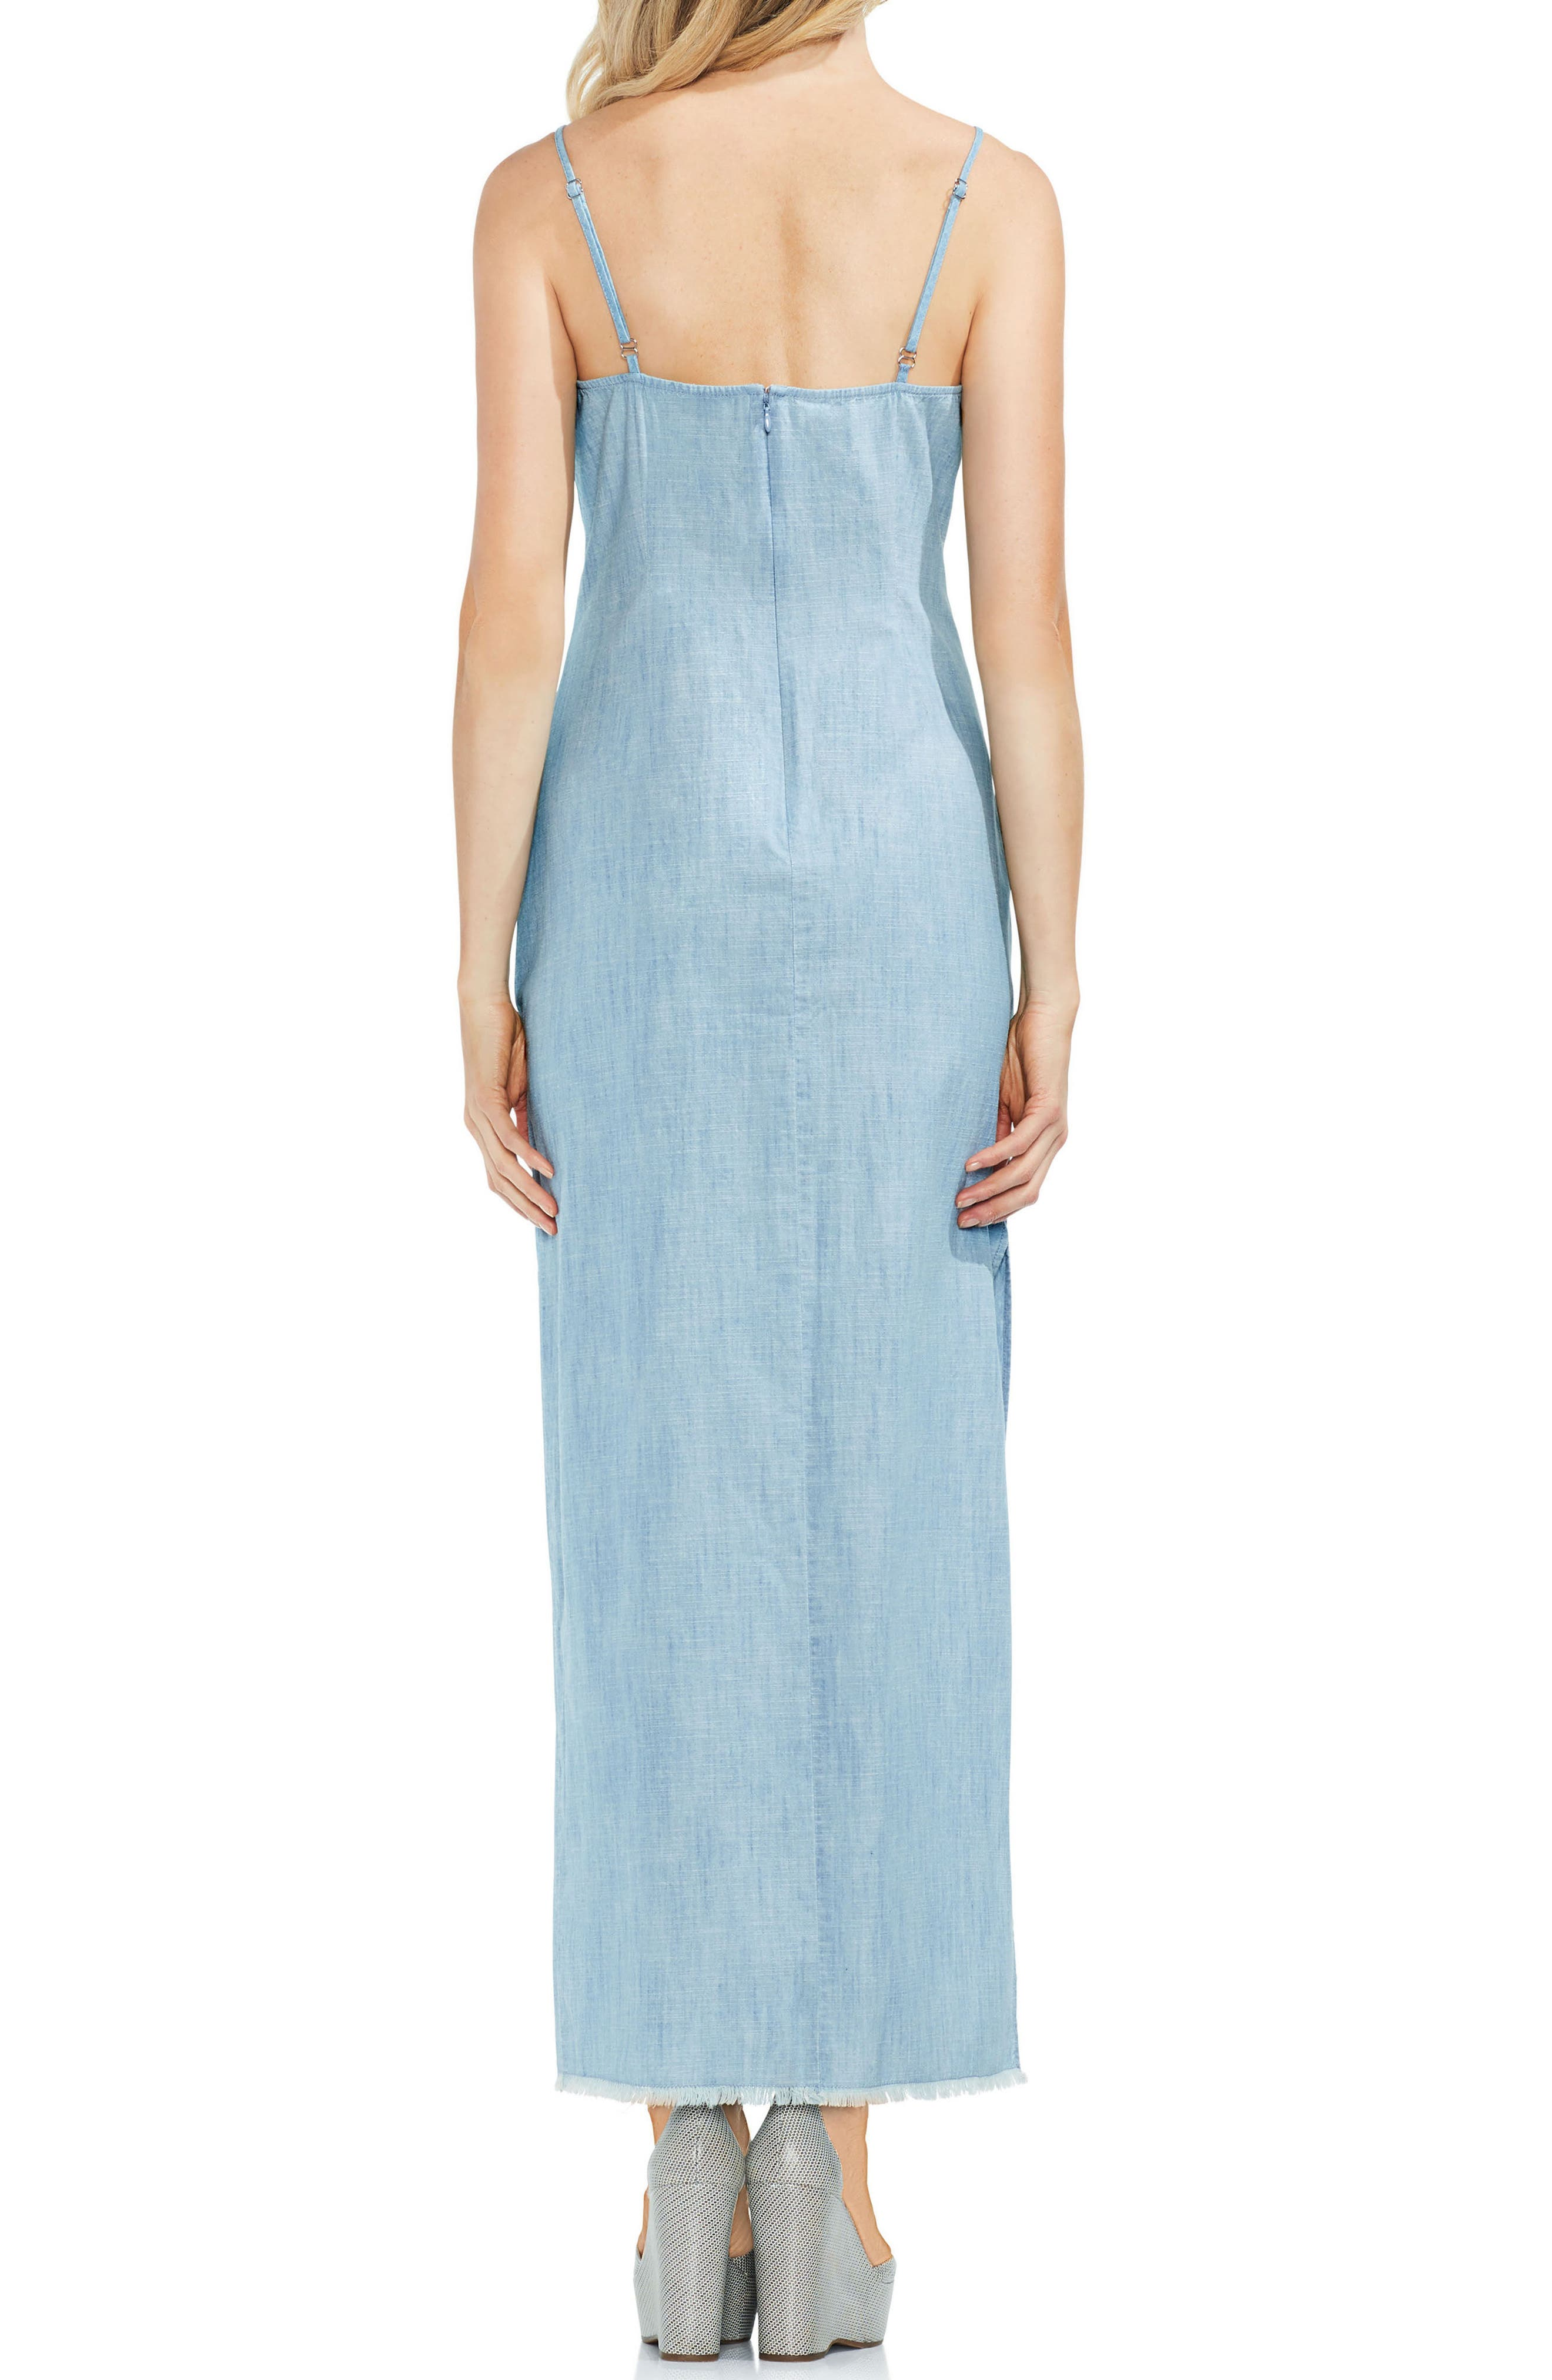 Chambray Maxi Slip Dress,                             Alternate thumbnail 2, color,                             400